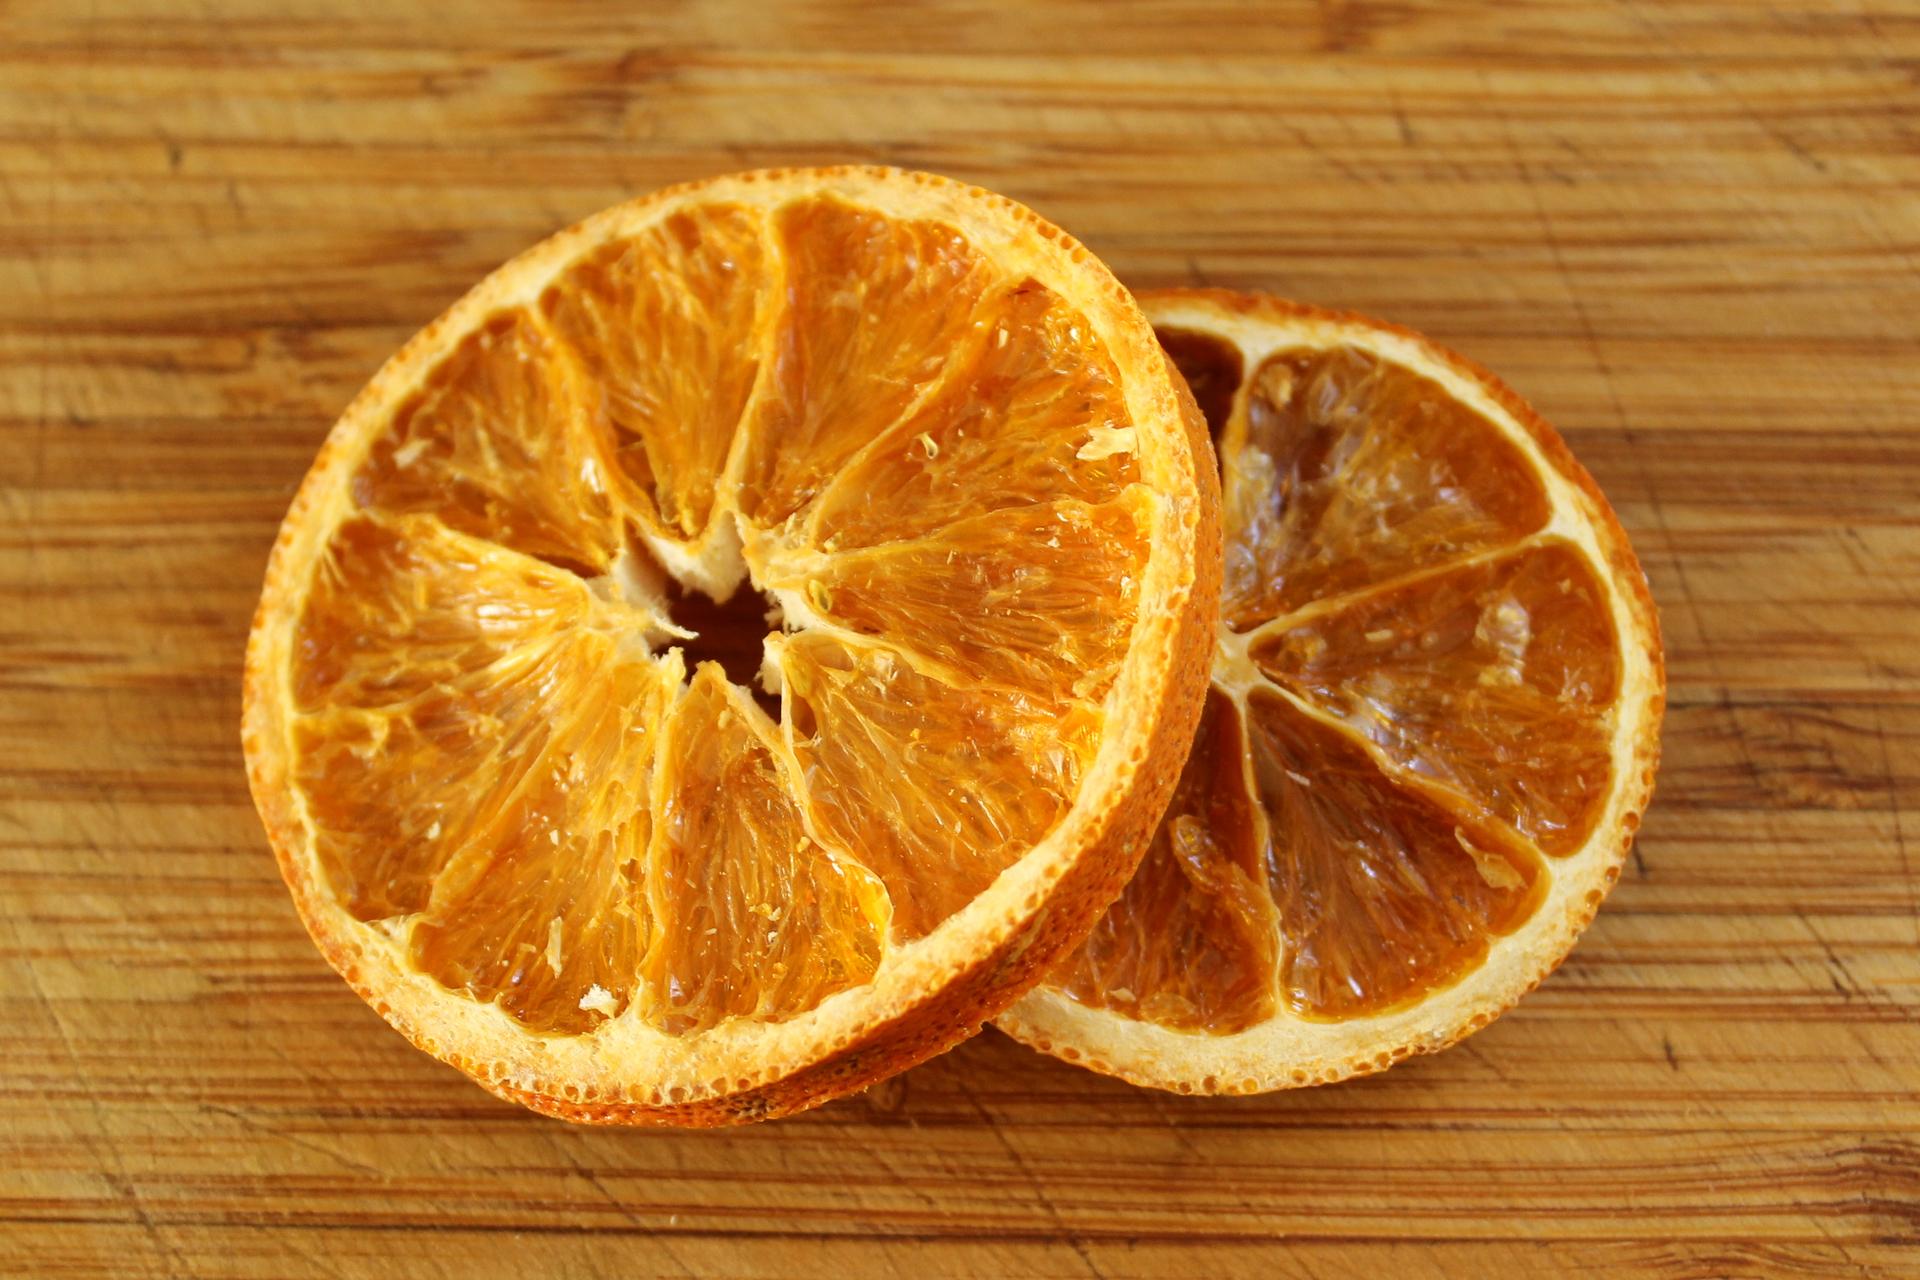 Dried orange slices.